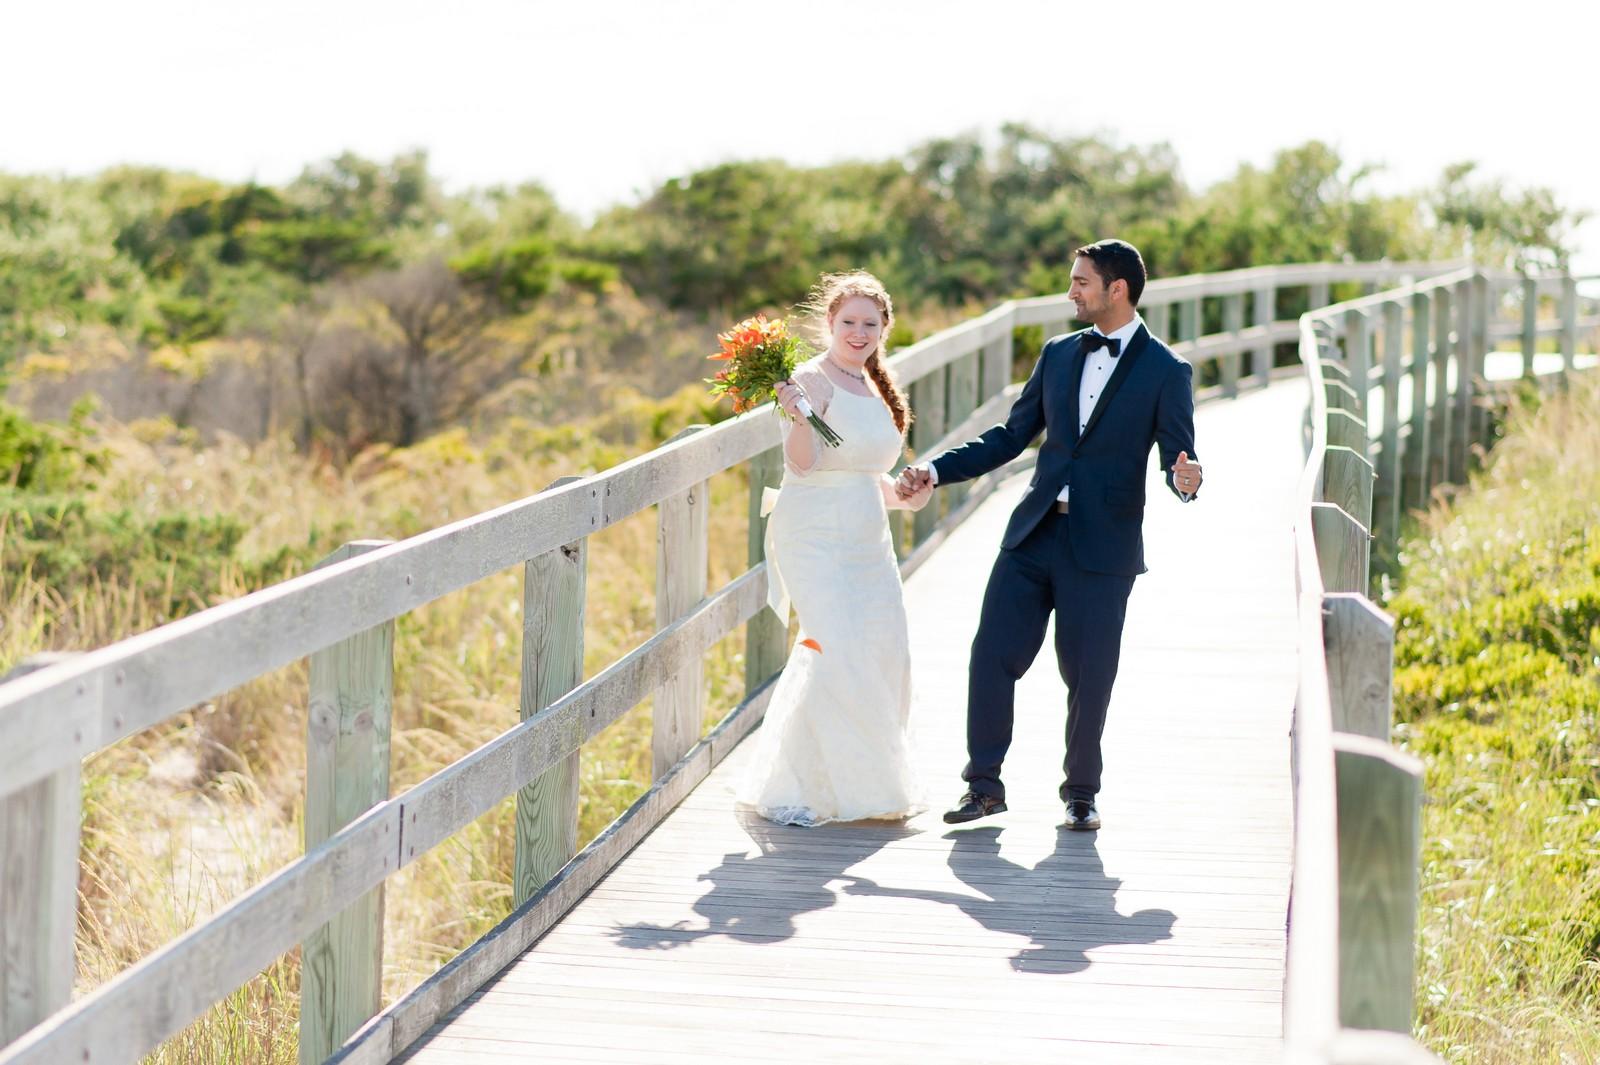 Sam and Yishai's Modern Orthodox Jewish Wedding at Crest Hollow Country Club, Woodbury NY, New York Photos by Chaim Schvarcz, Couple Portraits, Bride, Groom, Beach, Fire Island, Long Island